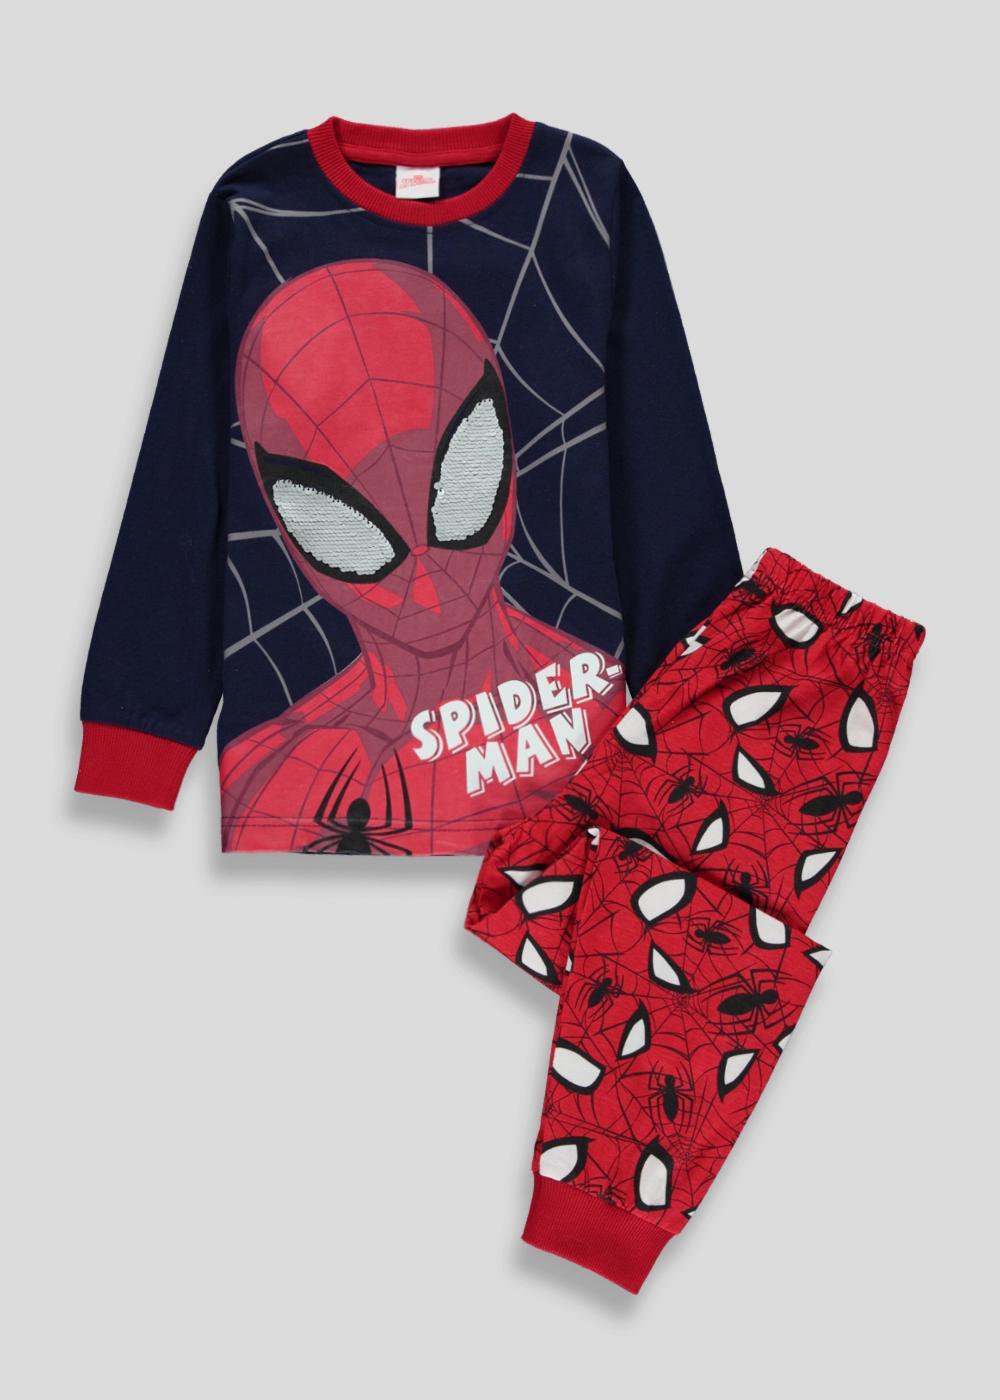 Boys Spider man Pyjamas Nightwear Long Sleeve Sizes 18-24 mths